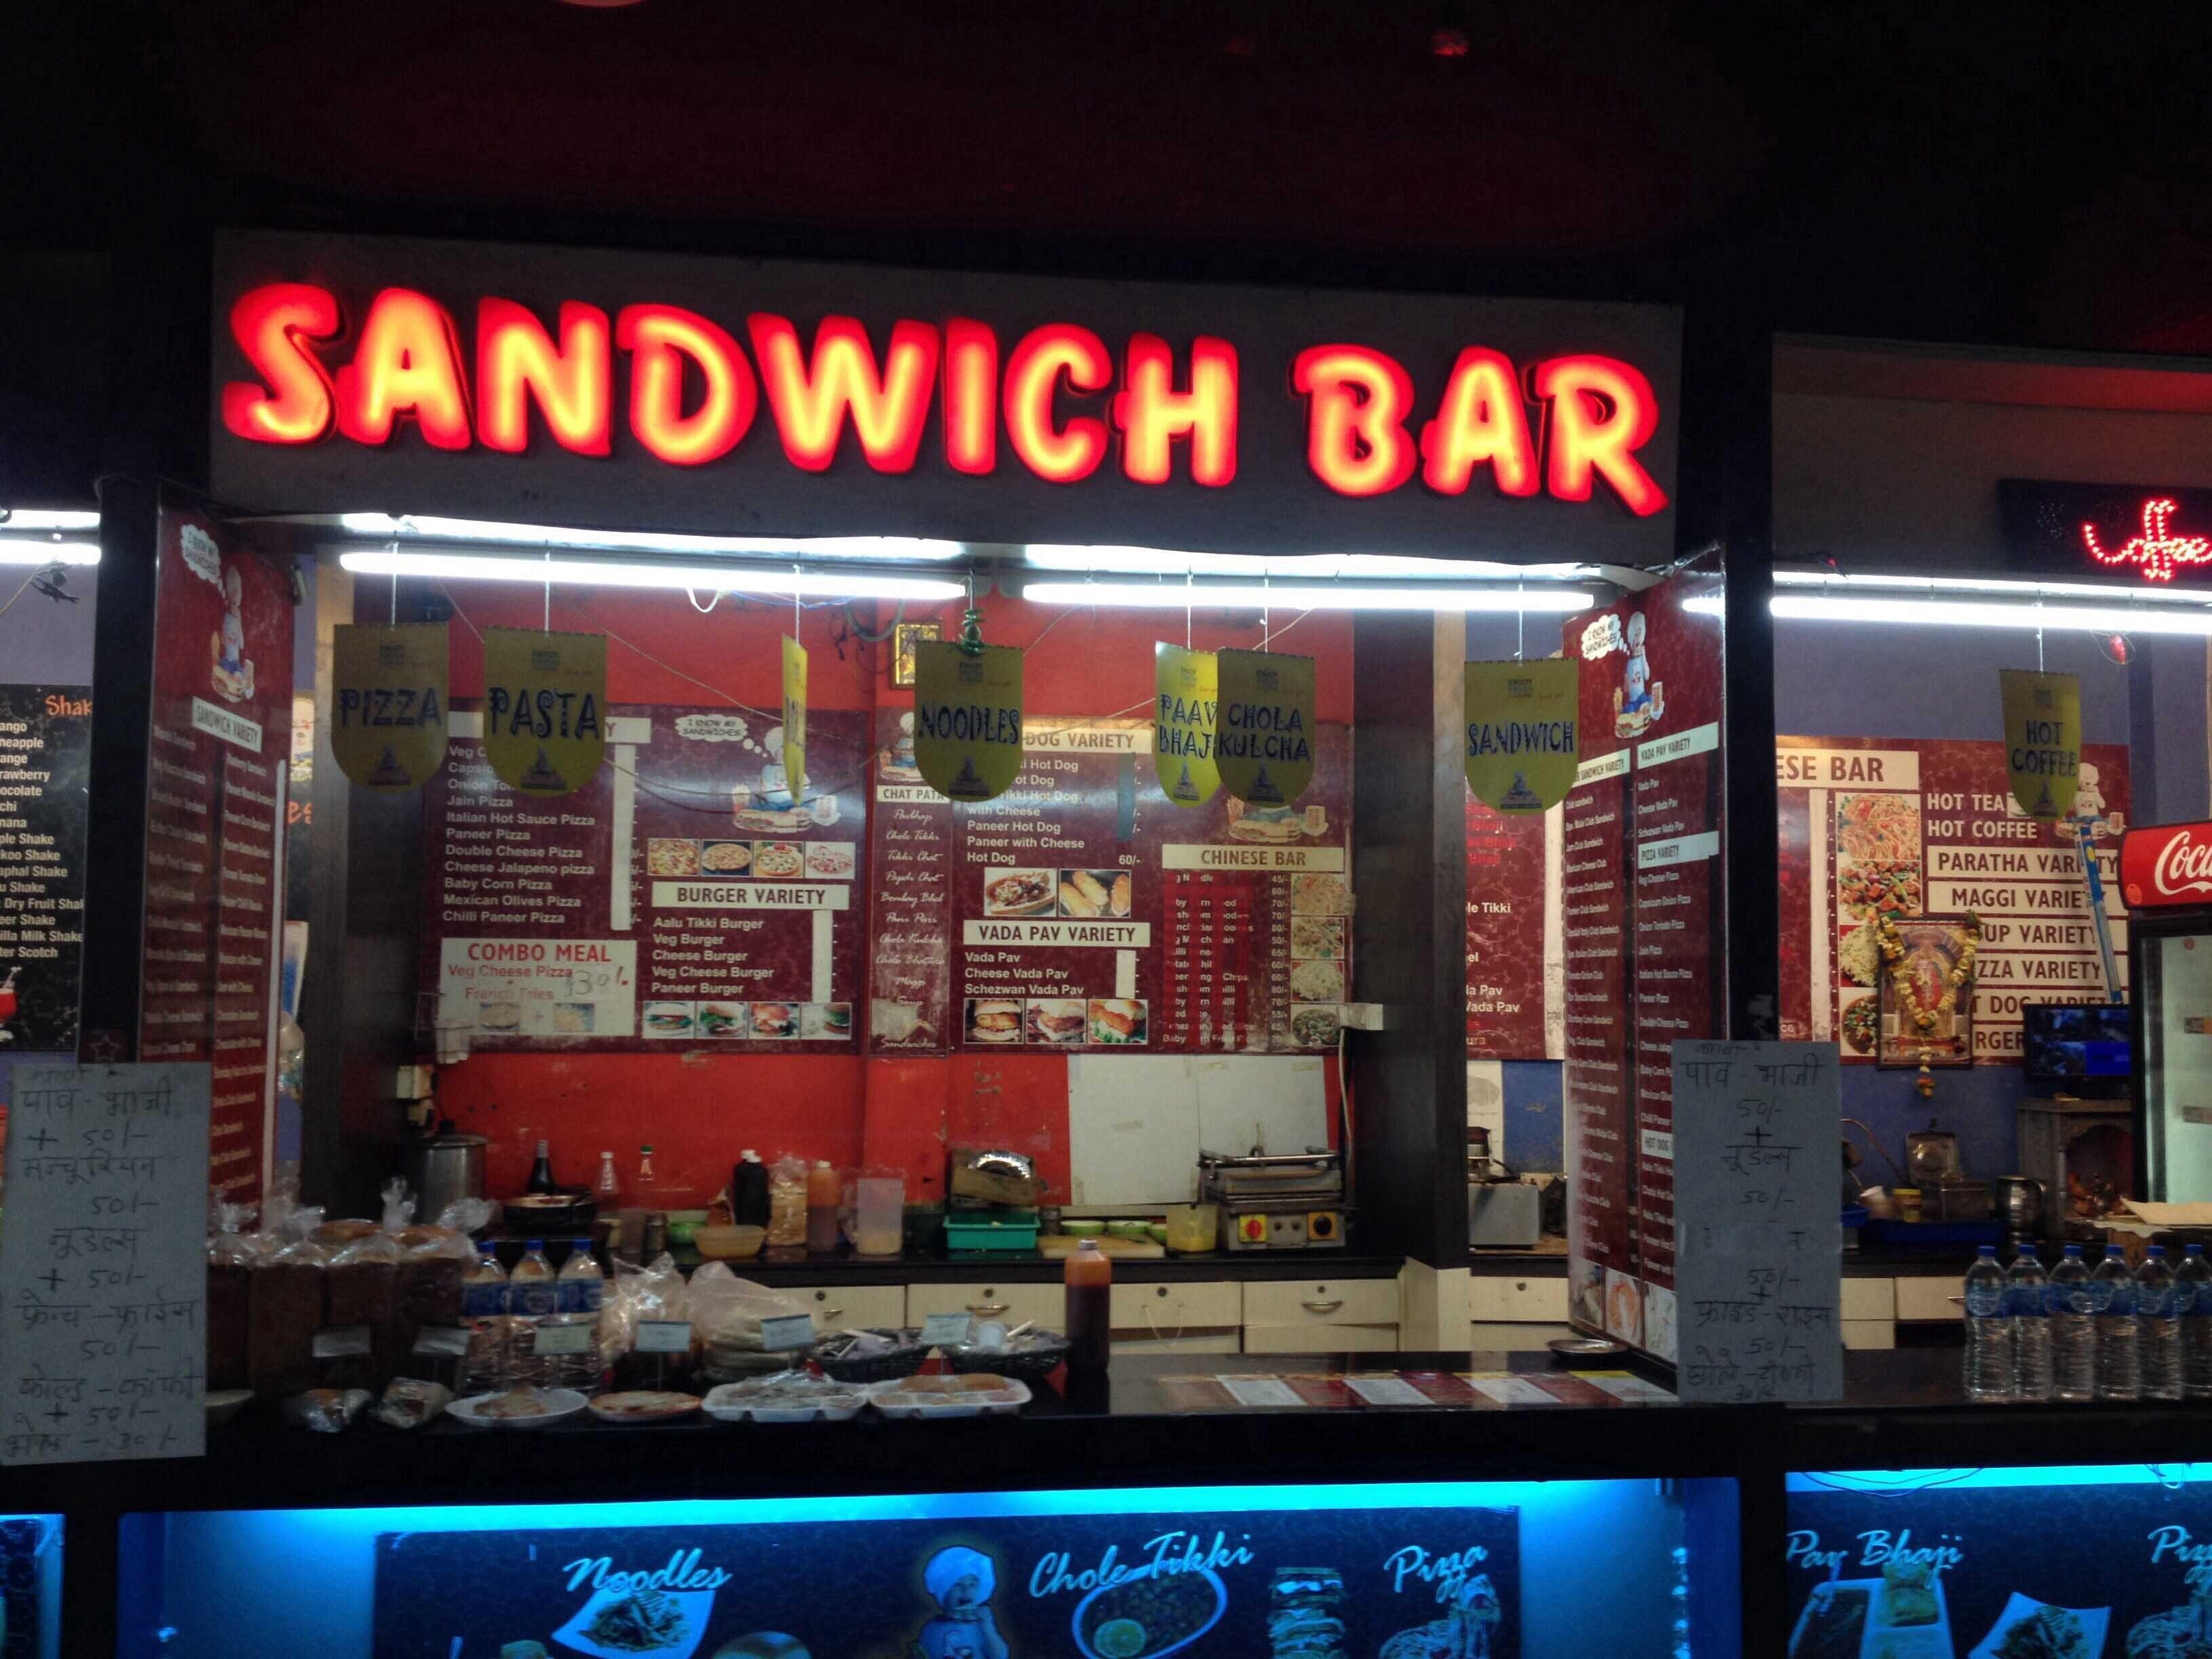 Sandwich Bar - RNT Marg - Indore Image